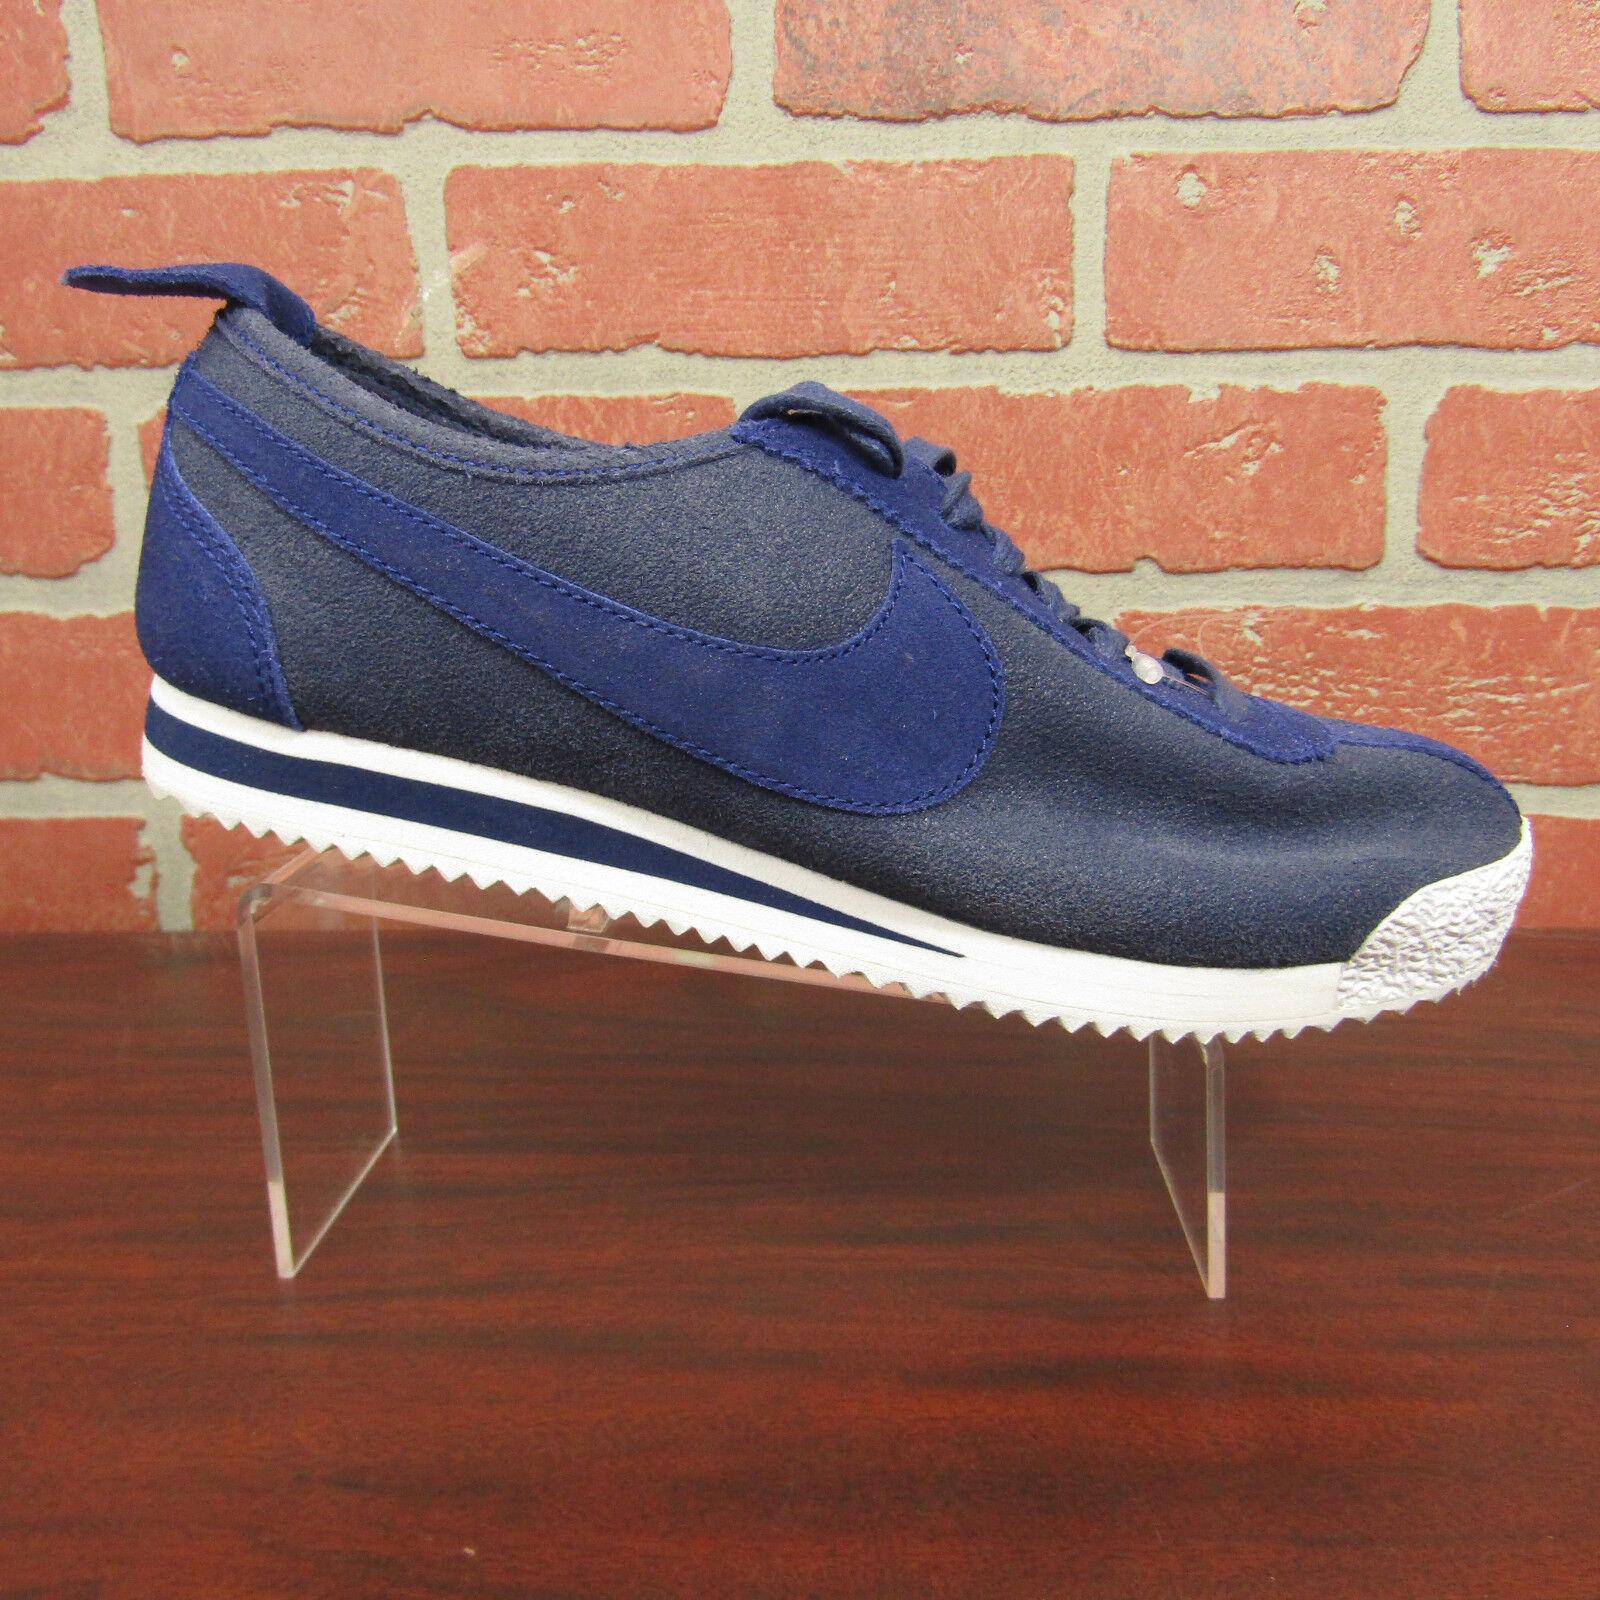 New Nike Cortez '72 Mens Shoes Size 8 Loyal Blue White 863173-400 S01F2